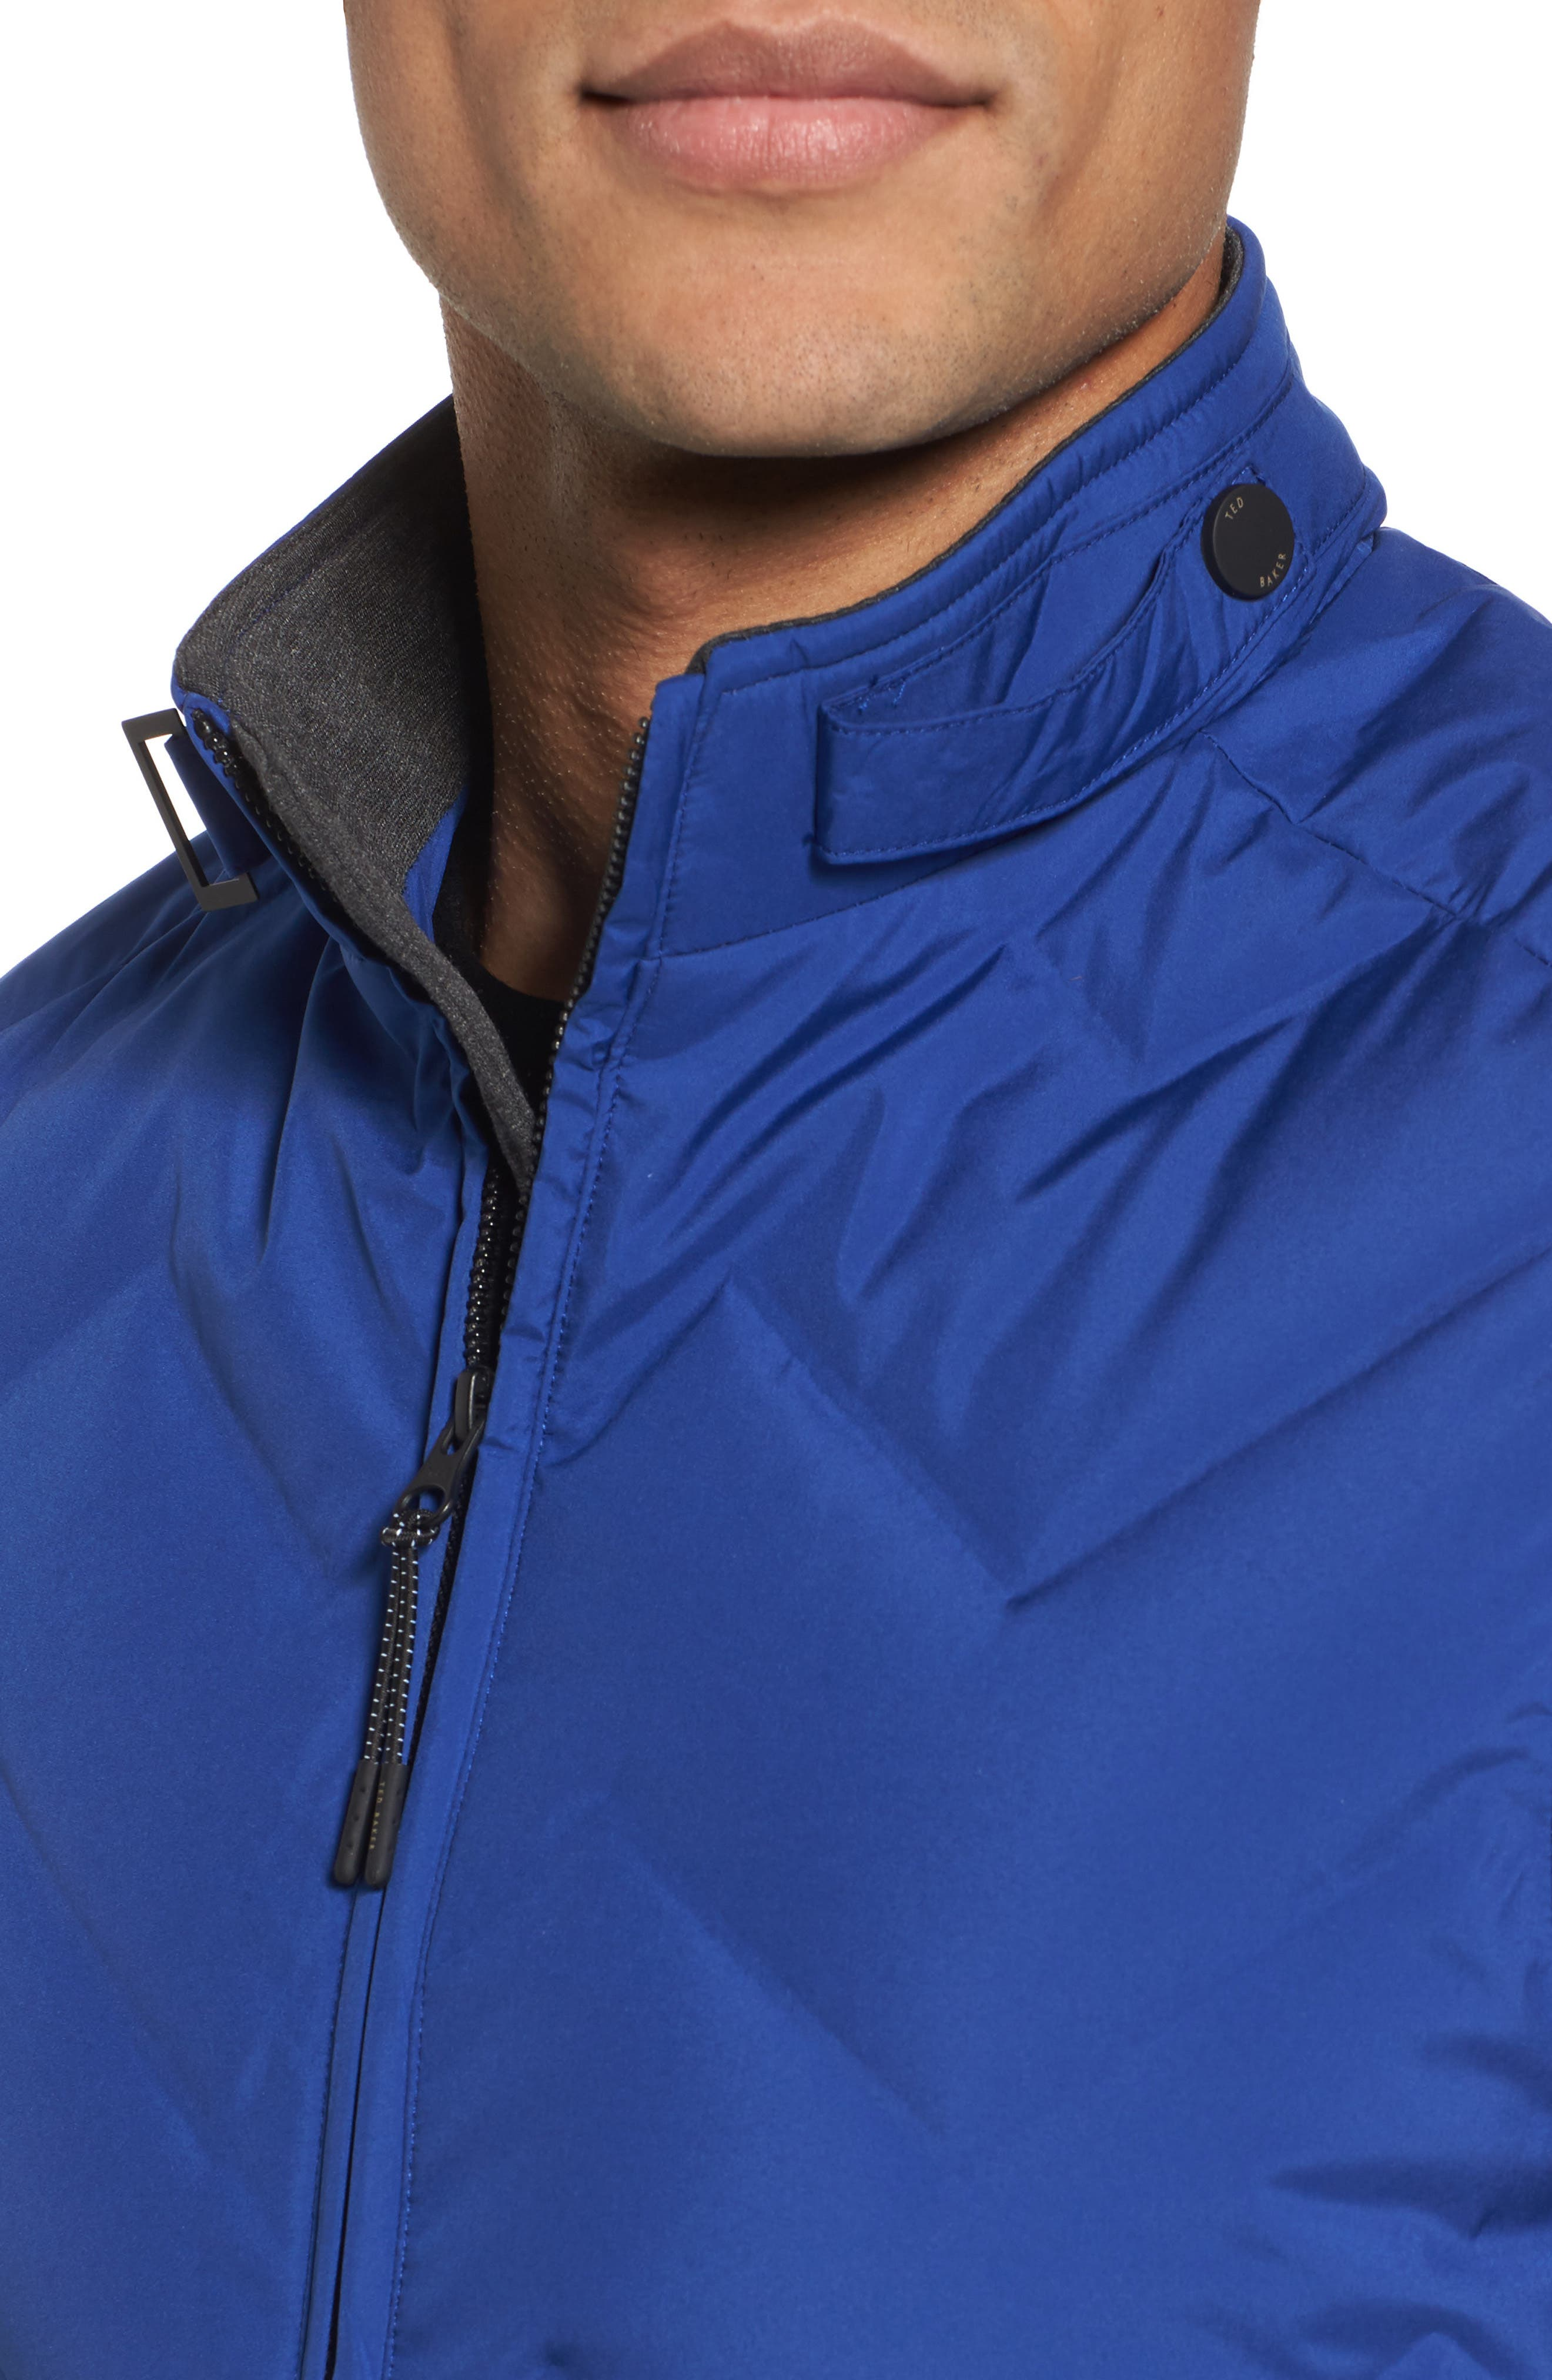 Hobart Down Vest,                             Alternate thumbnail 4, color,                             BRIGHT BLUE